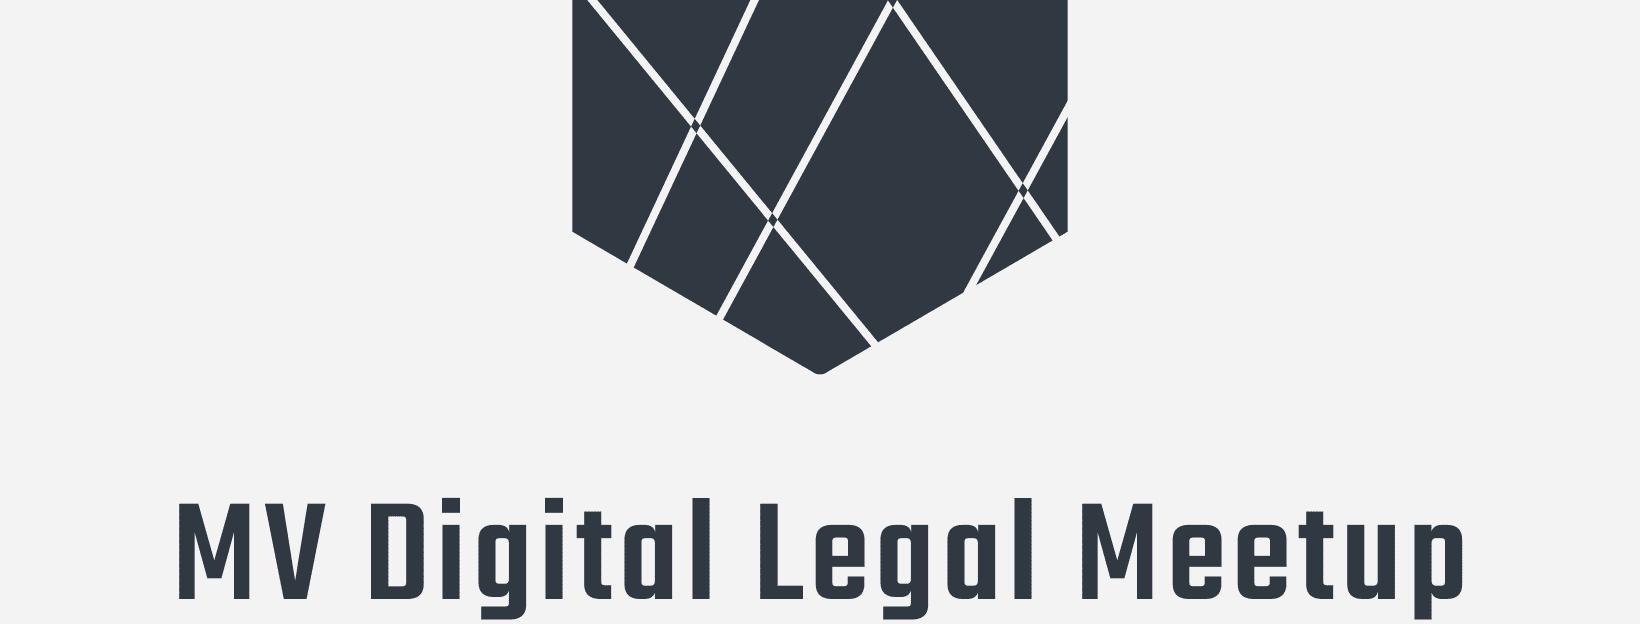 Logo Social Media Legal Meetup